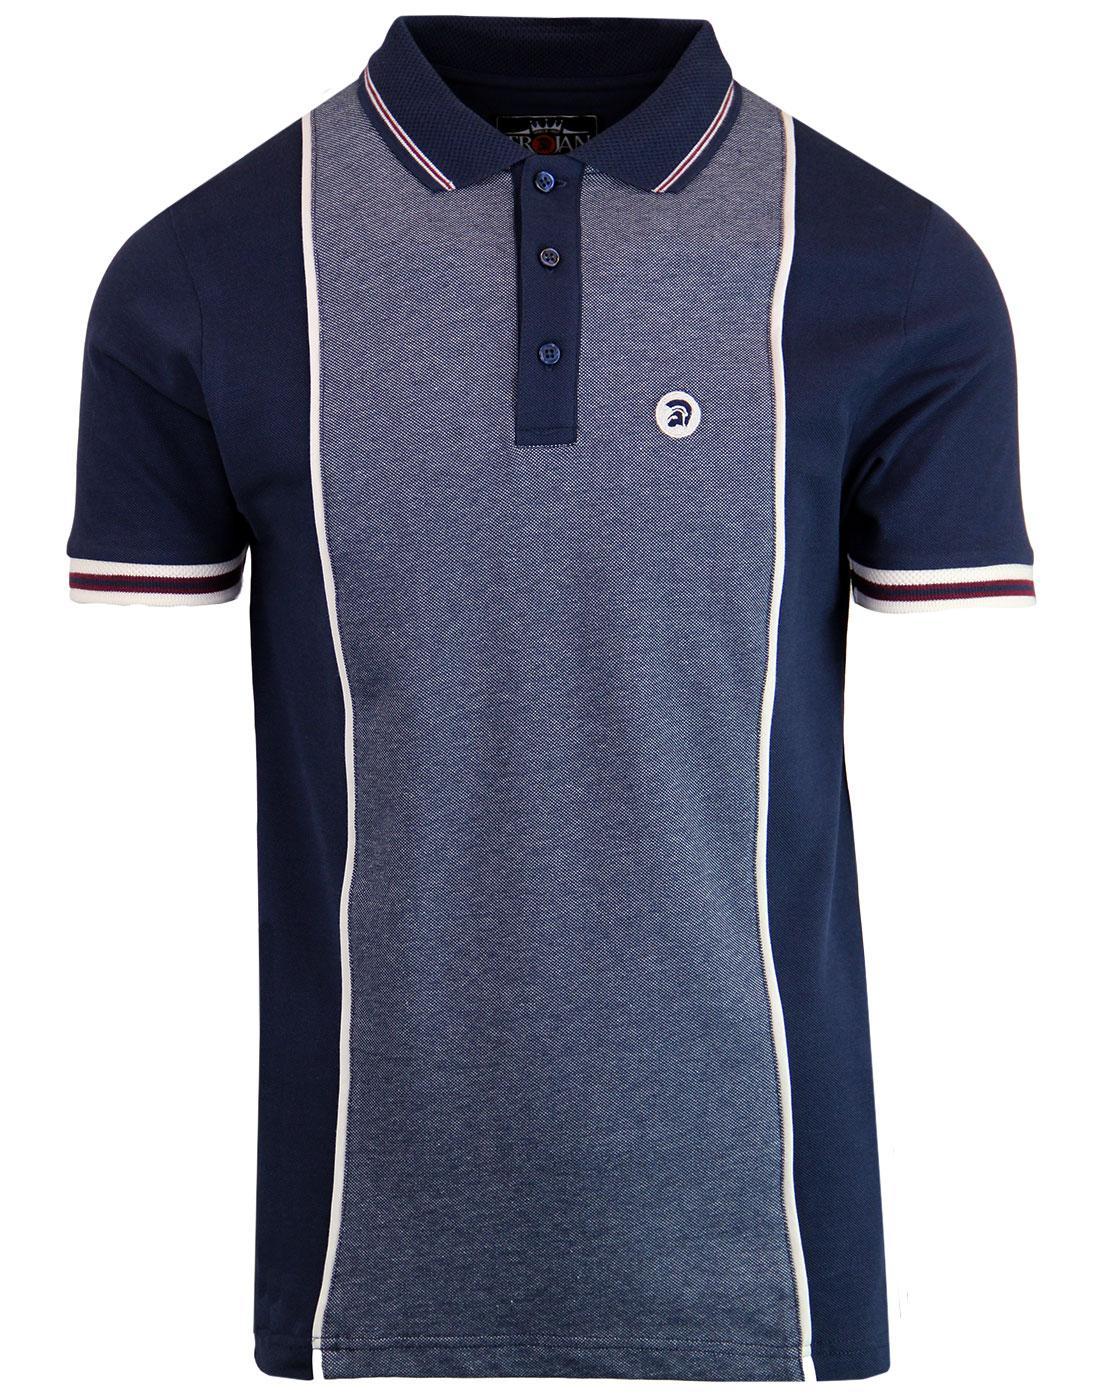 TROJAN RECORDS Mod Ska Oxford Panel Polo Shirt (N)